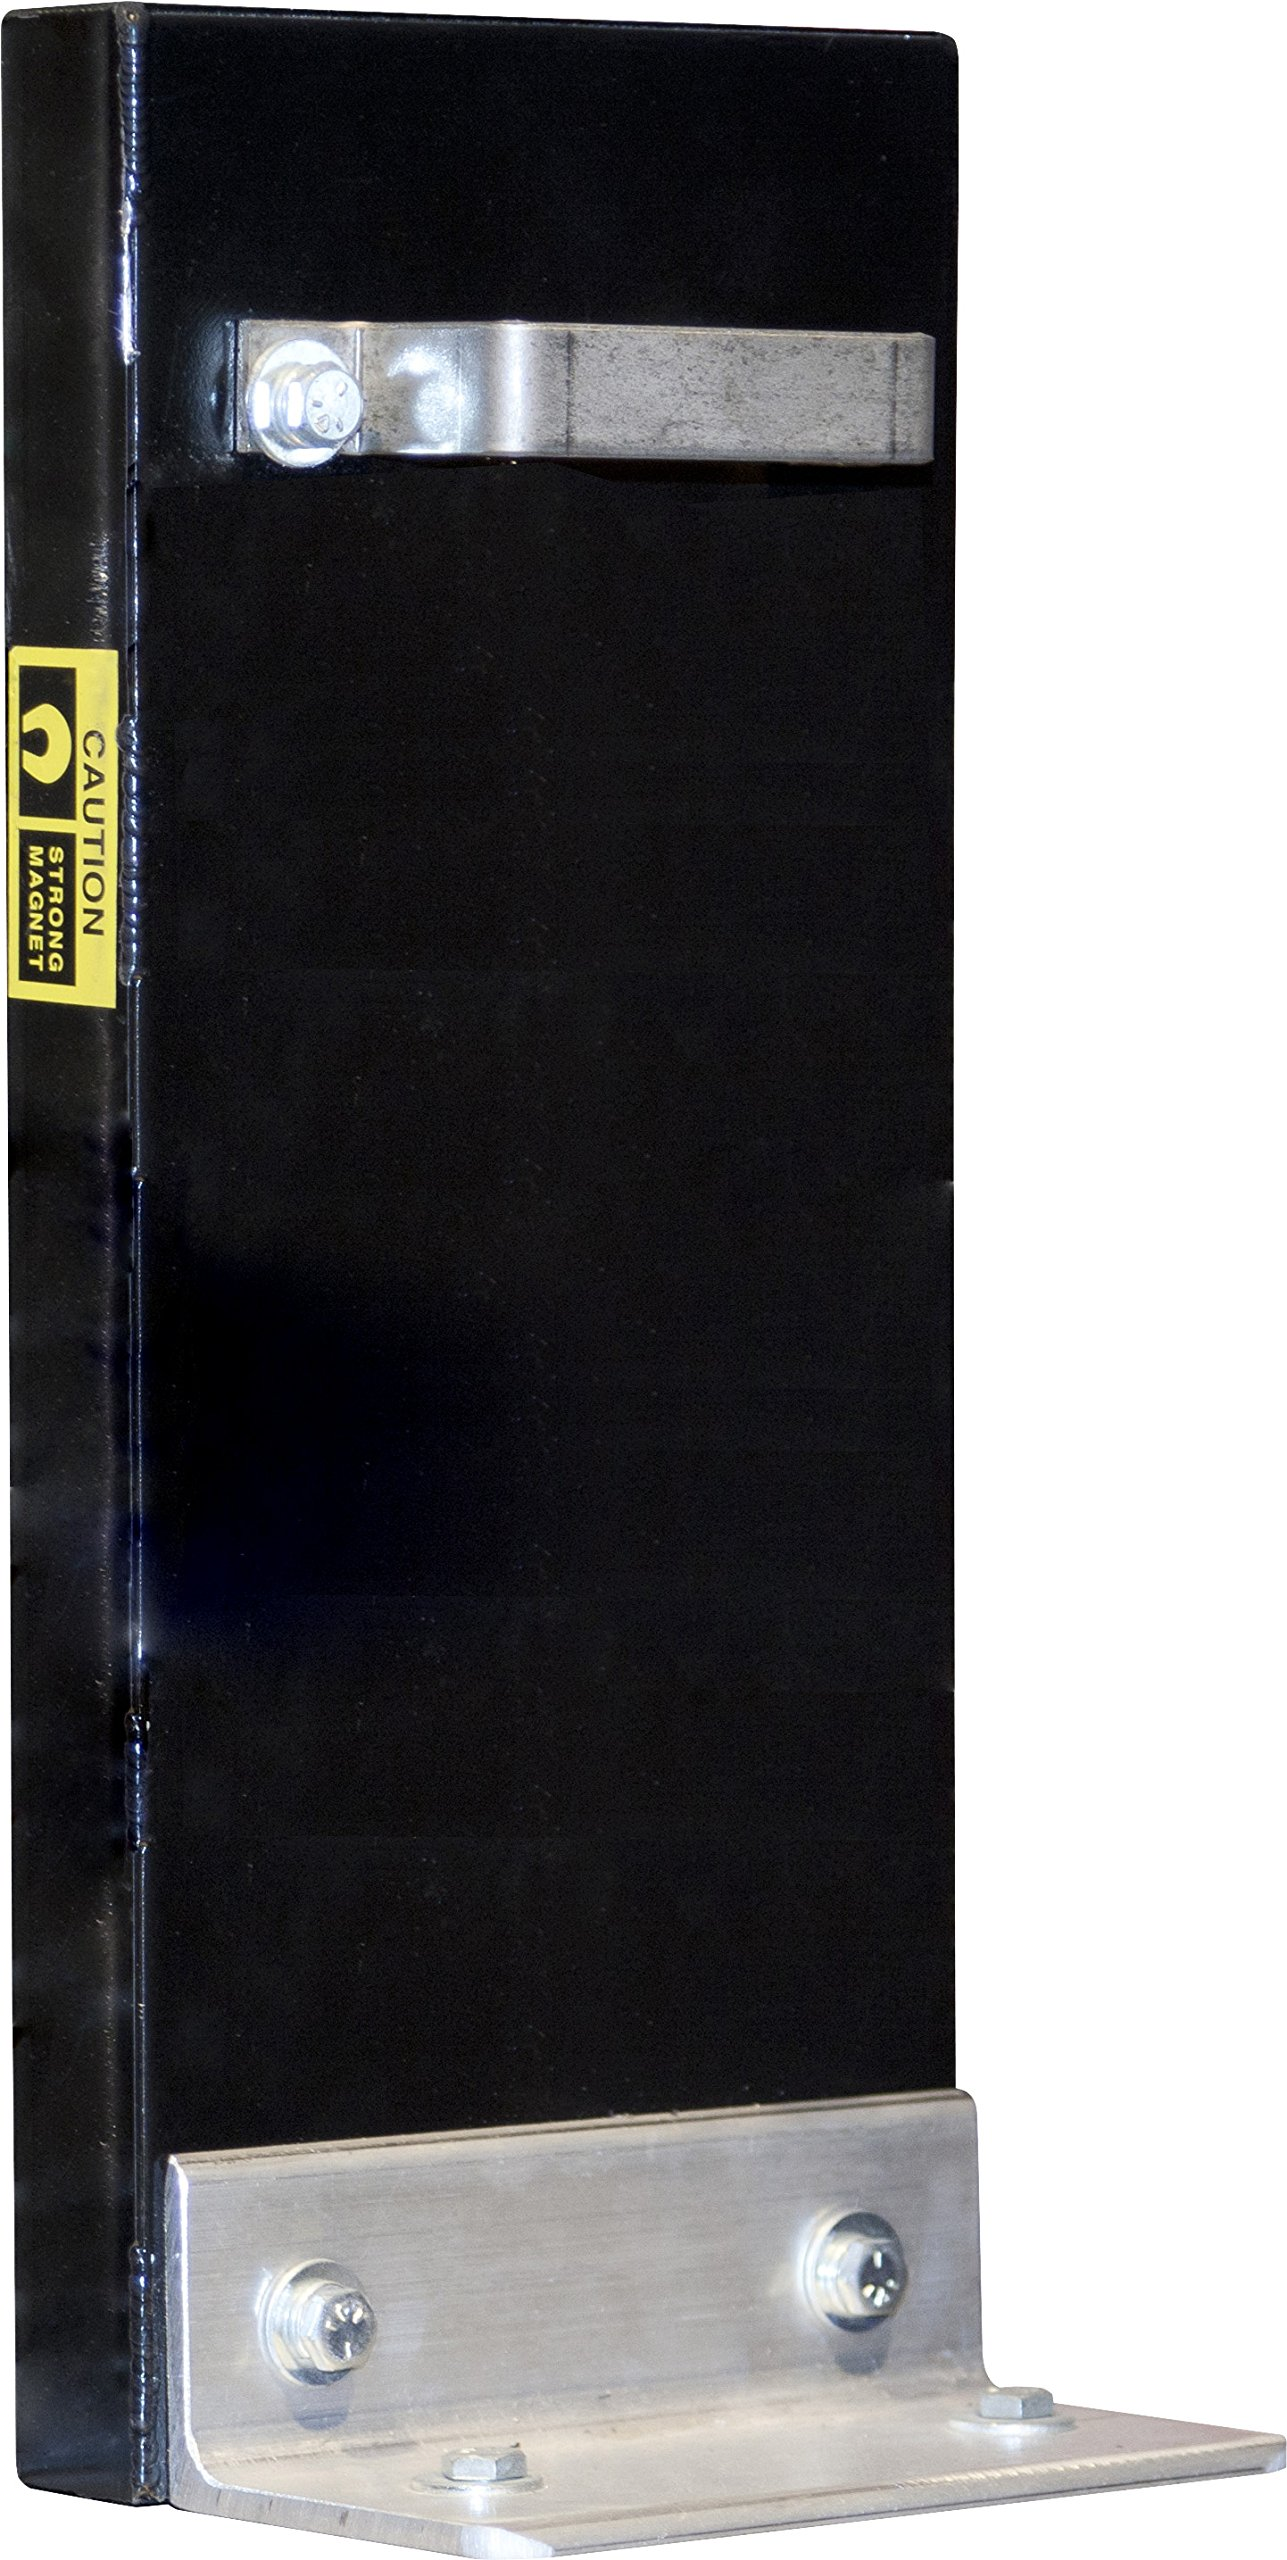 MAG-MATE TNF12 Magnetic Sheet Fanner/Separator, 20-30 Gauge/12''/15 lb